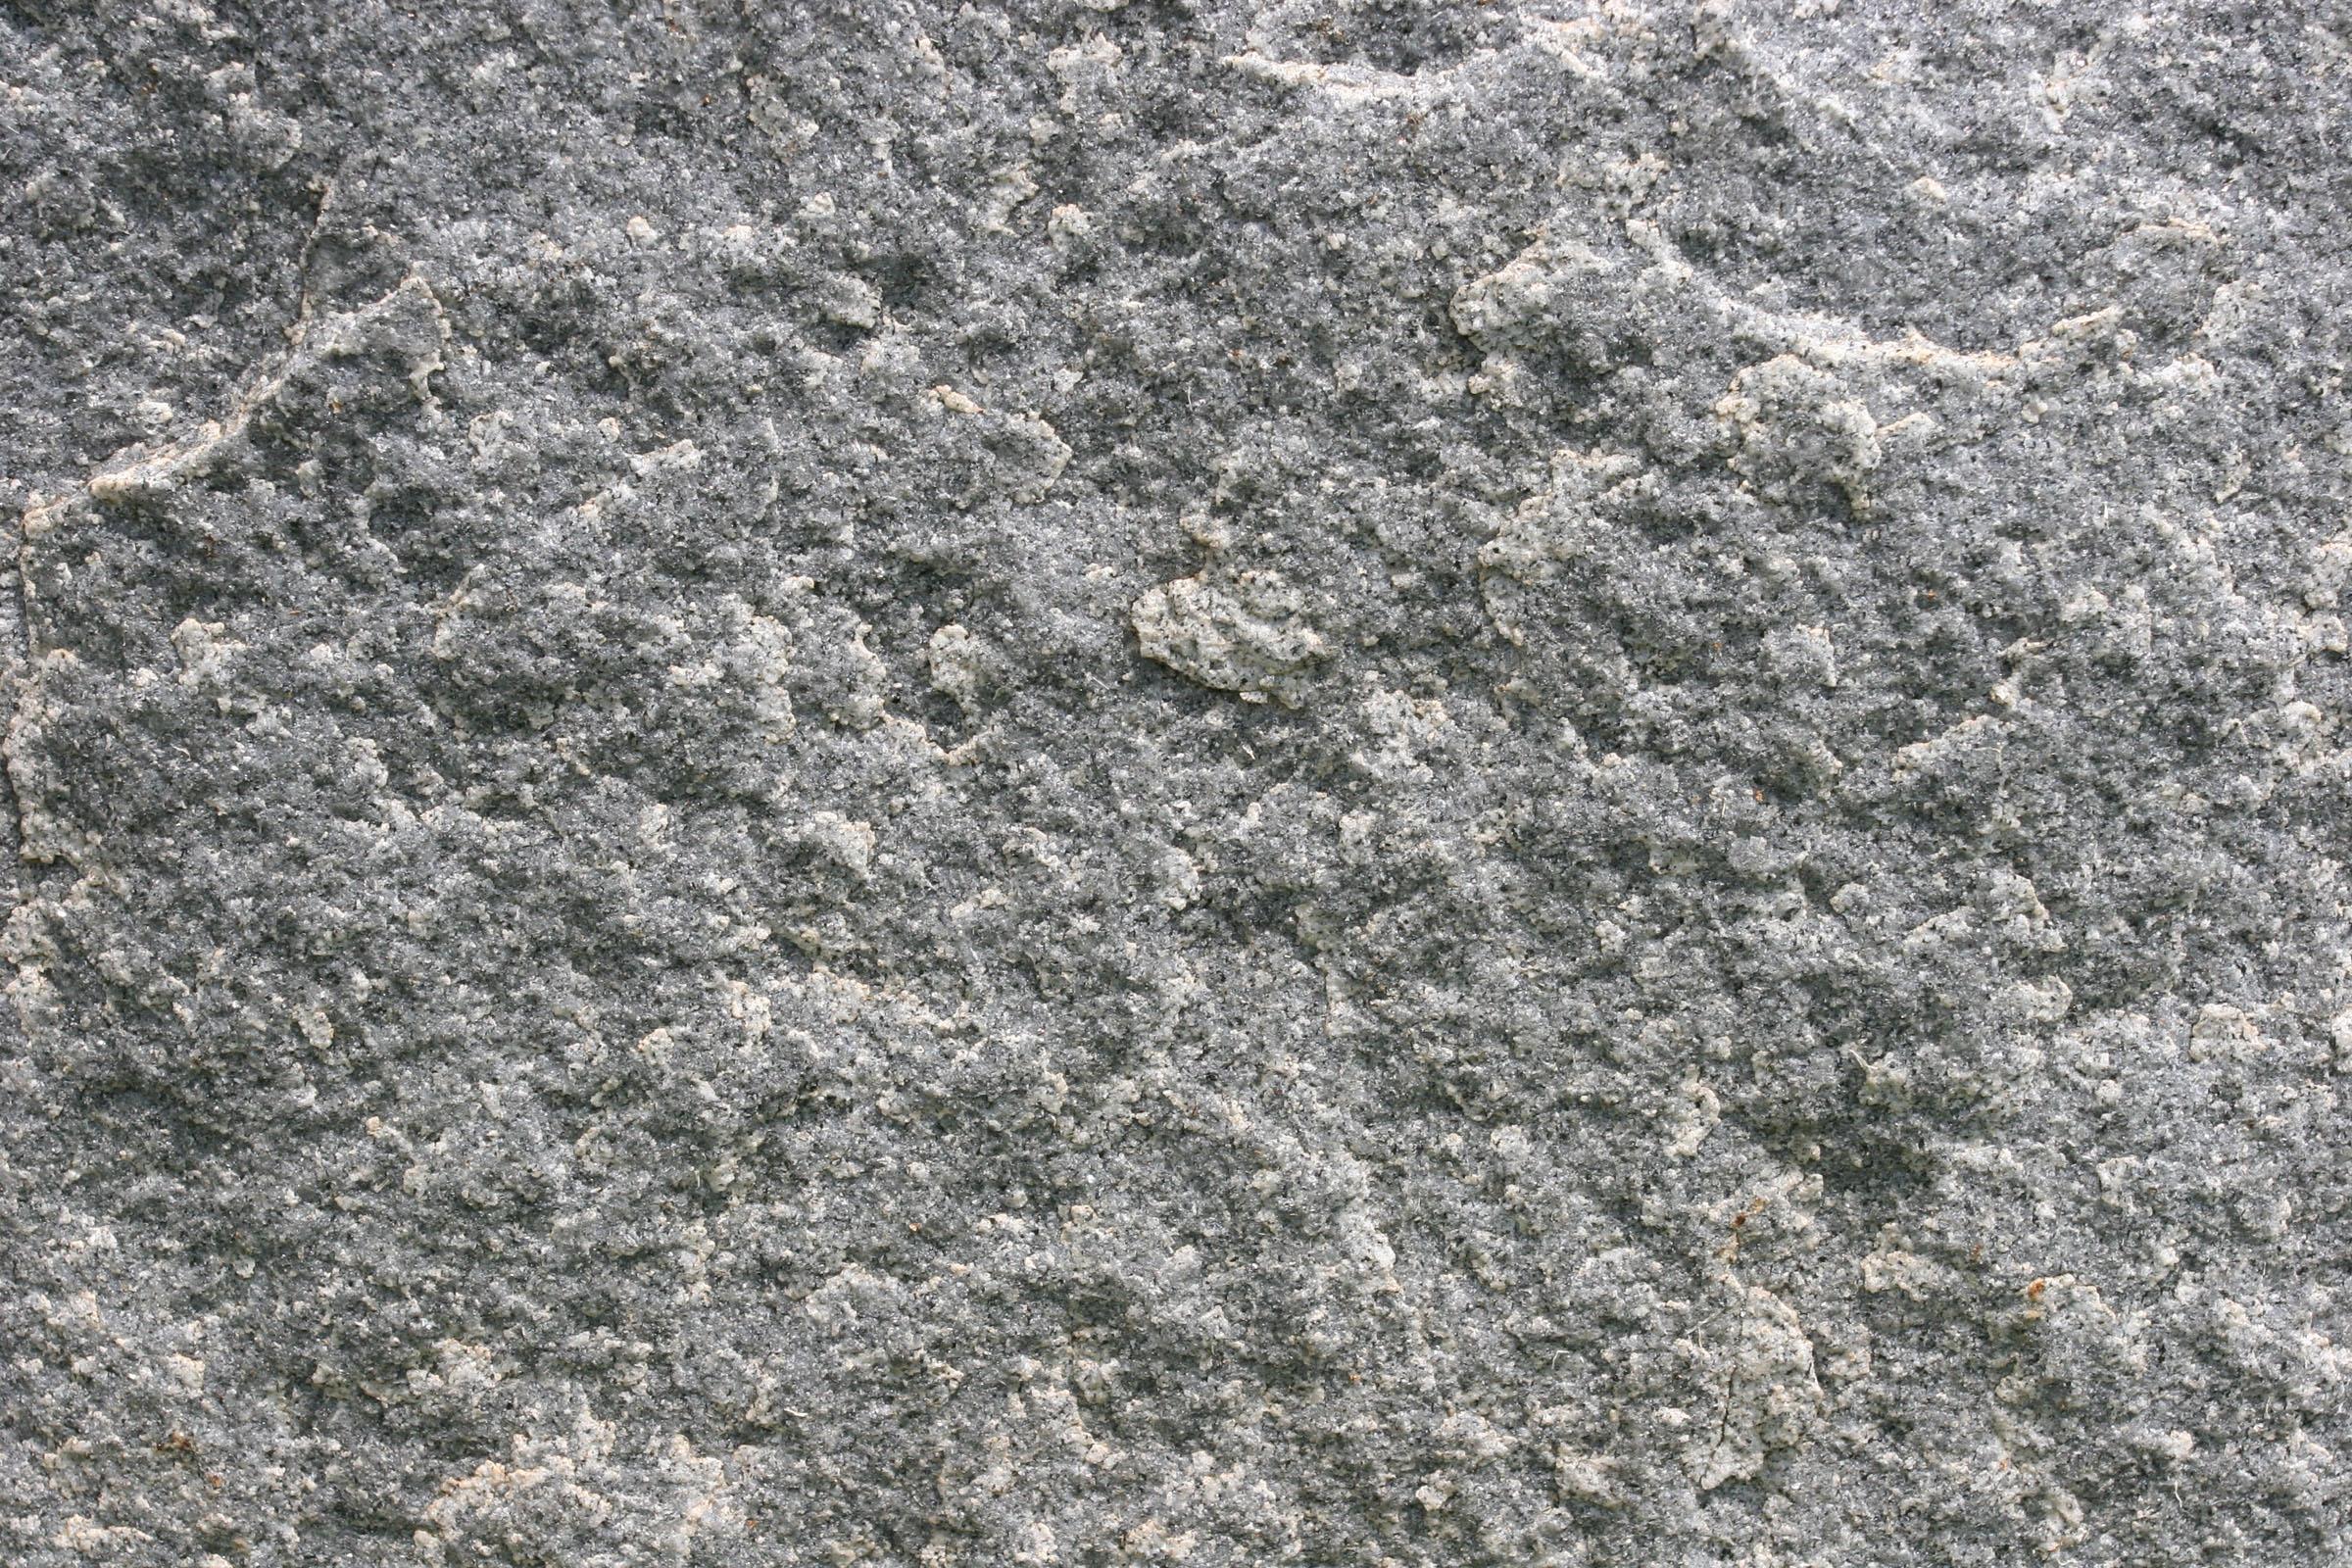 Black Stone Texture Wallpaper image gallery 2400x1600